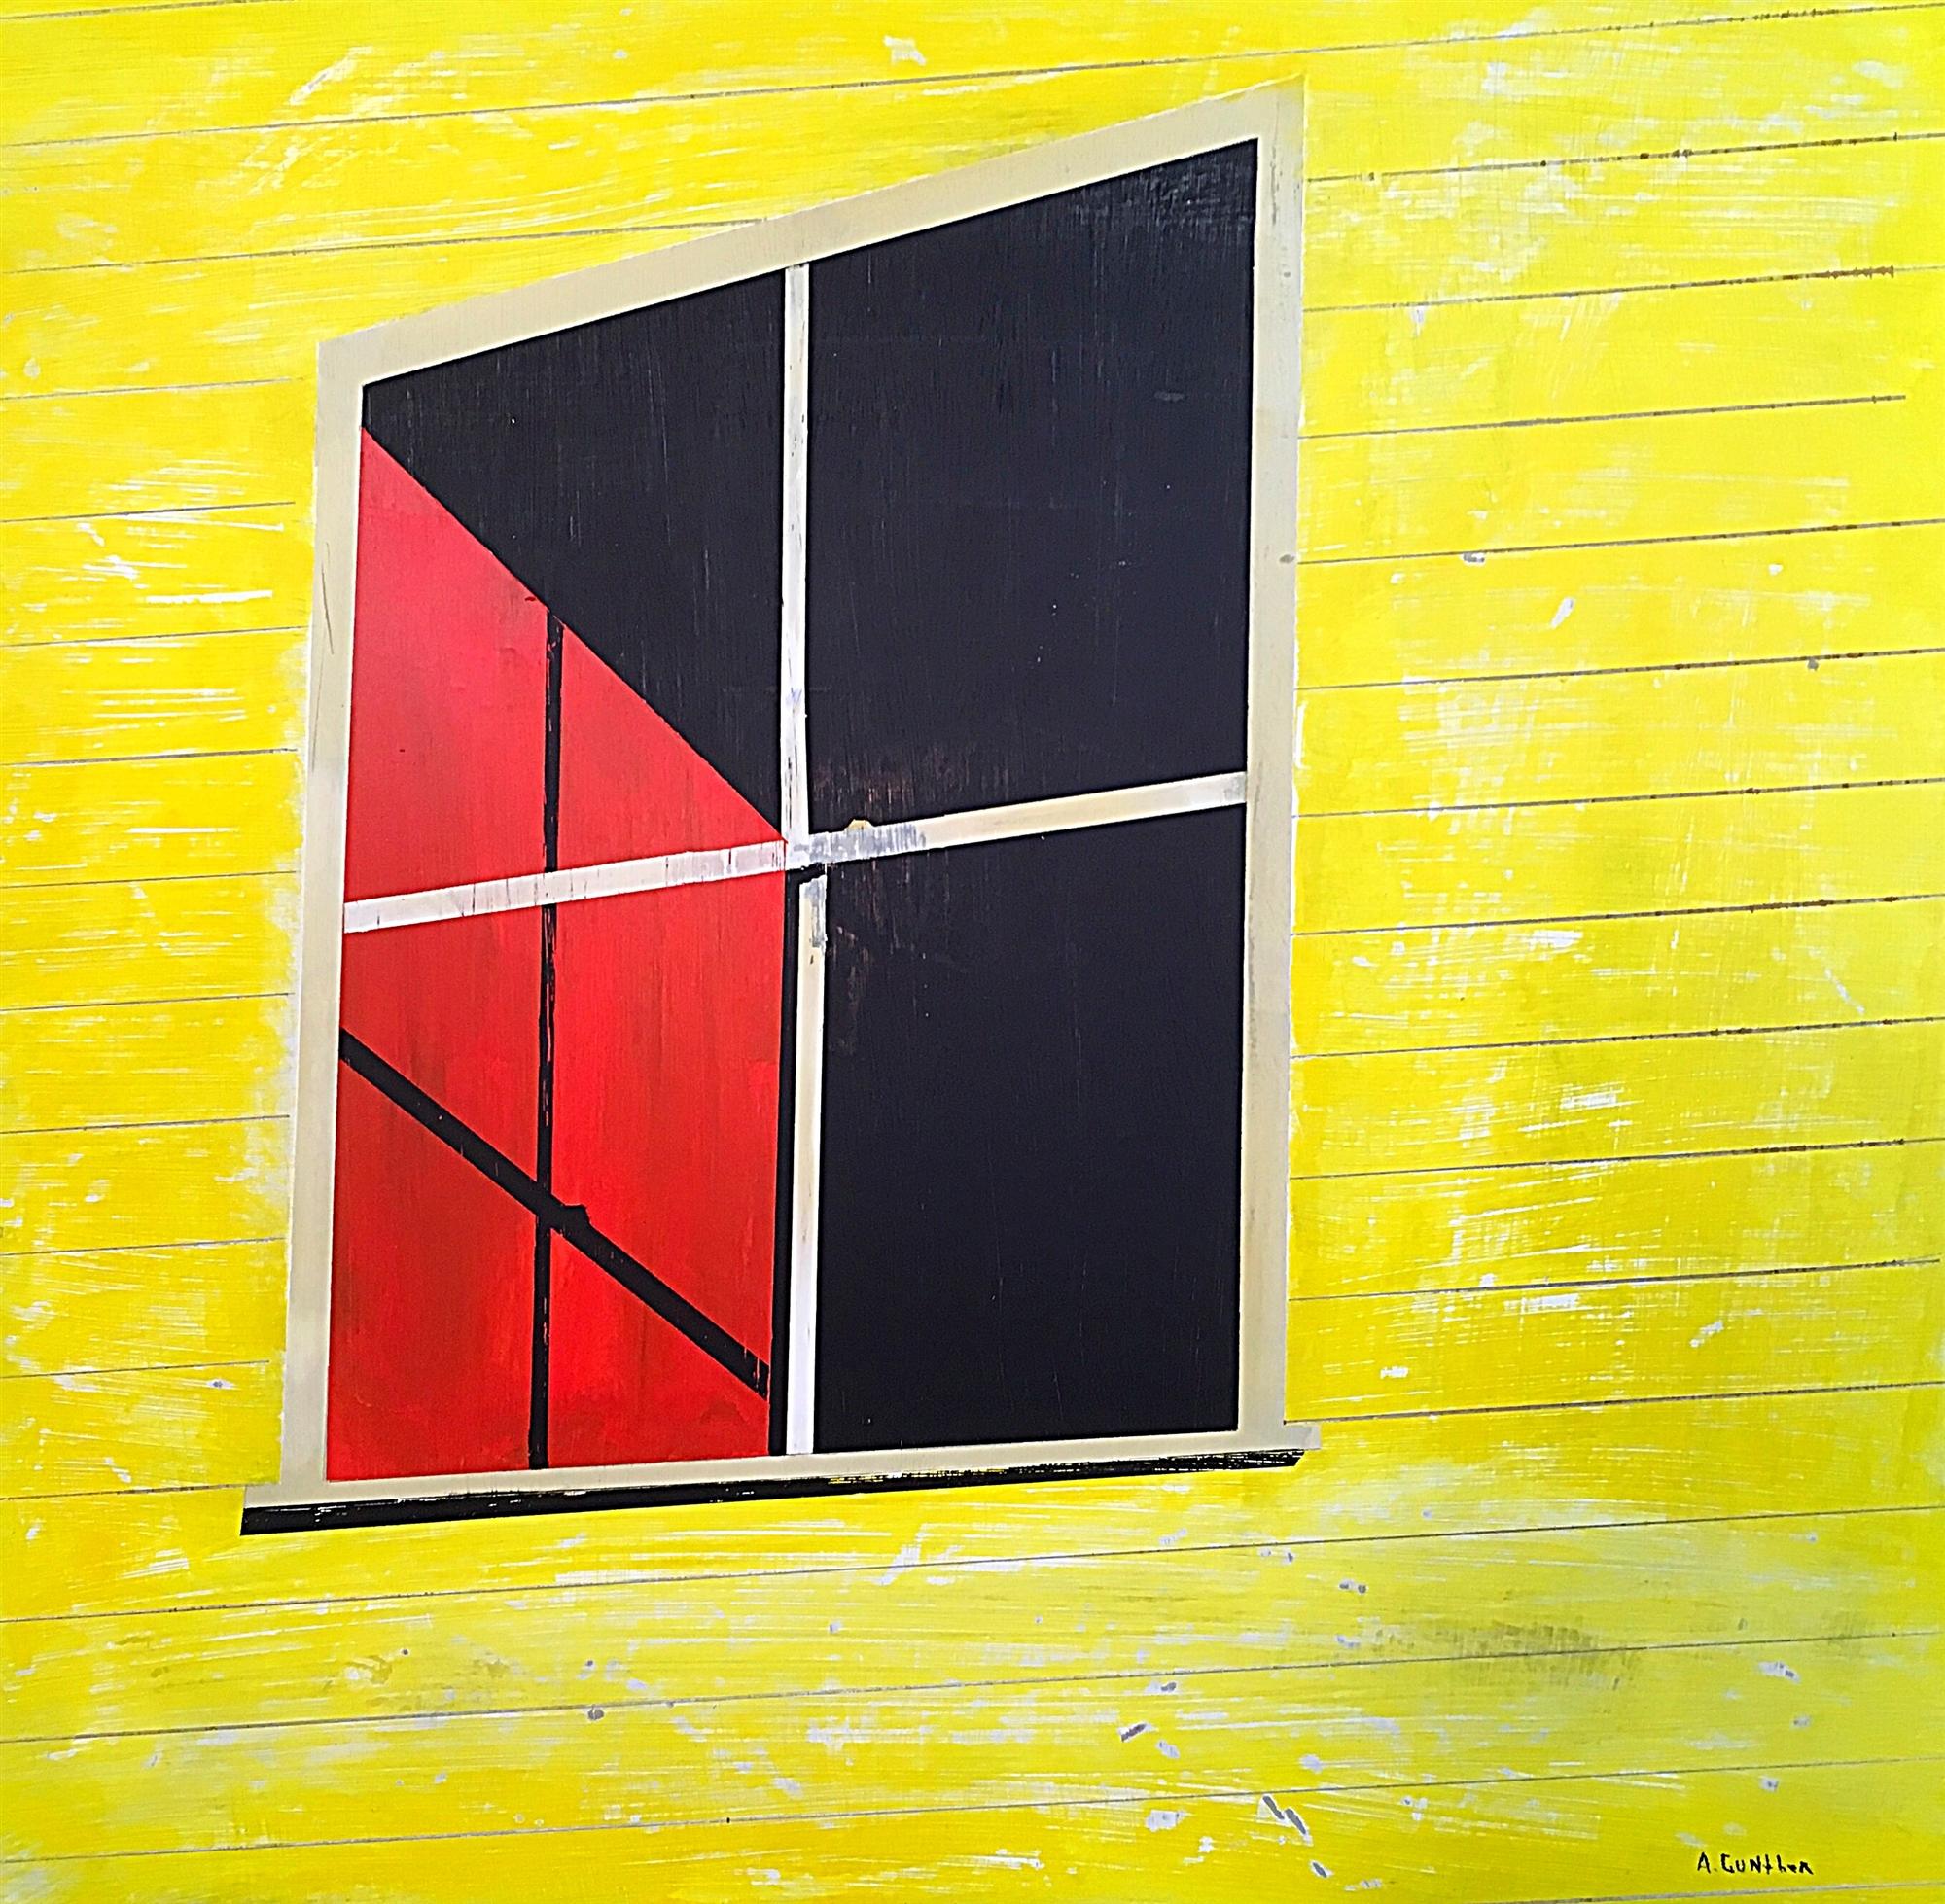 Arthur H. Gunther III\'s Original Contemporary Art For Sale by ARTmine